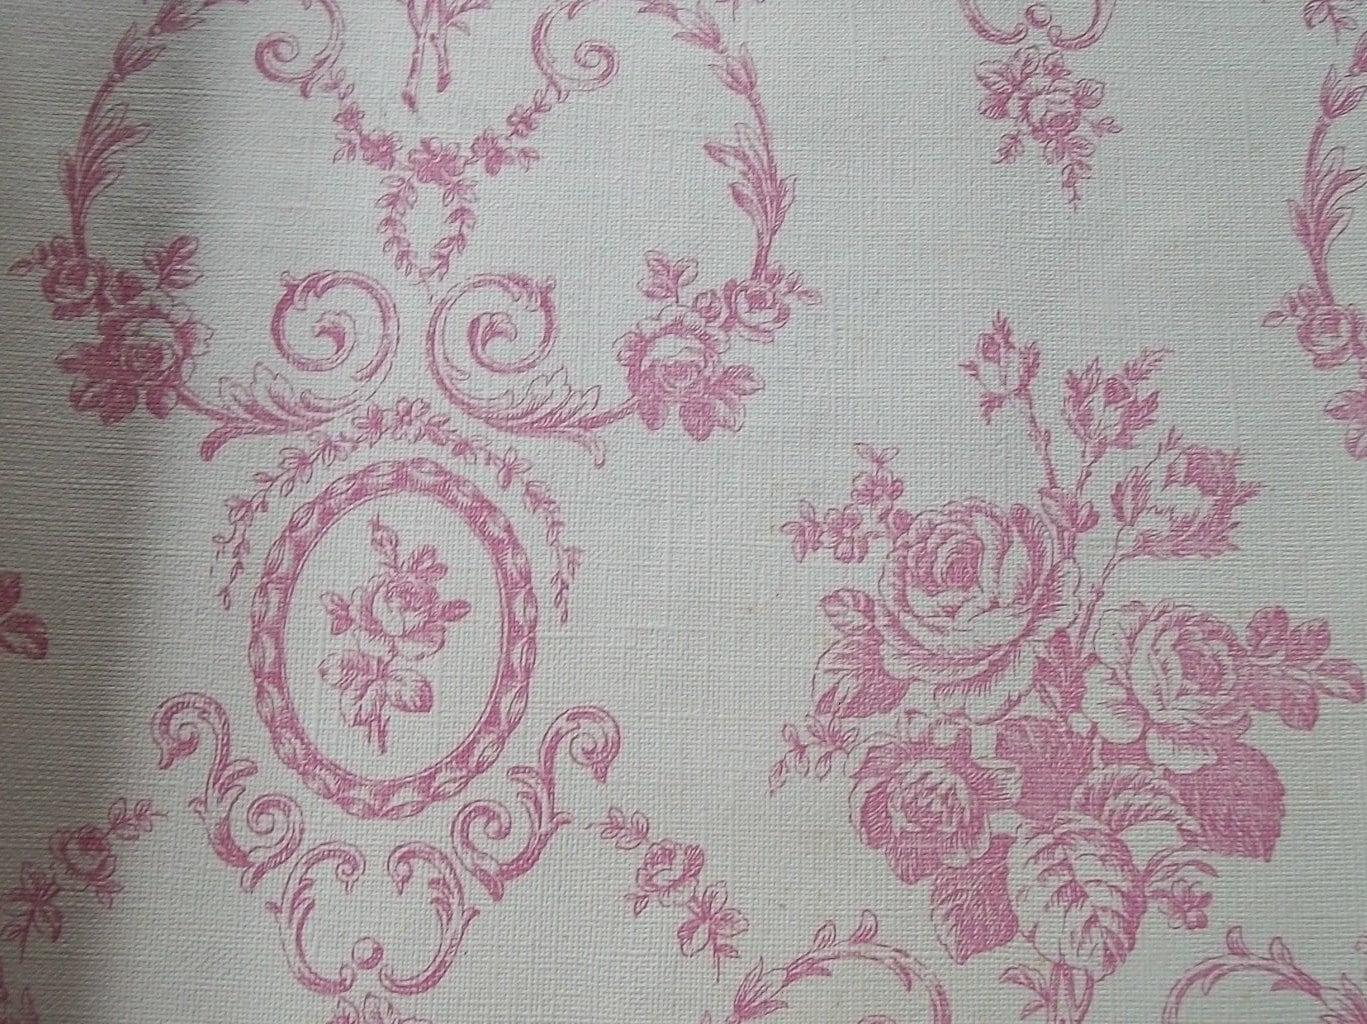 Vintage french wallpaper sample sheet pink roses for paper for Old french wallpaper